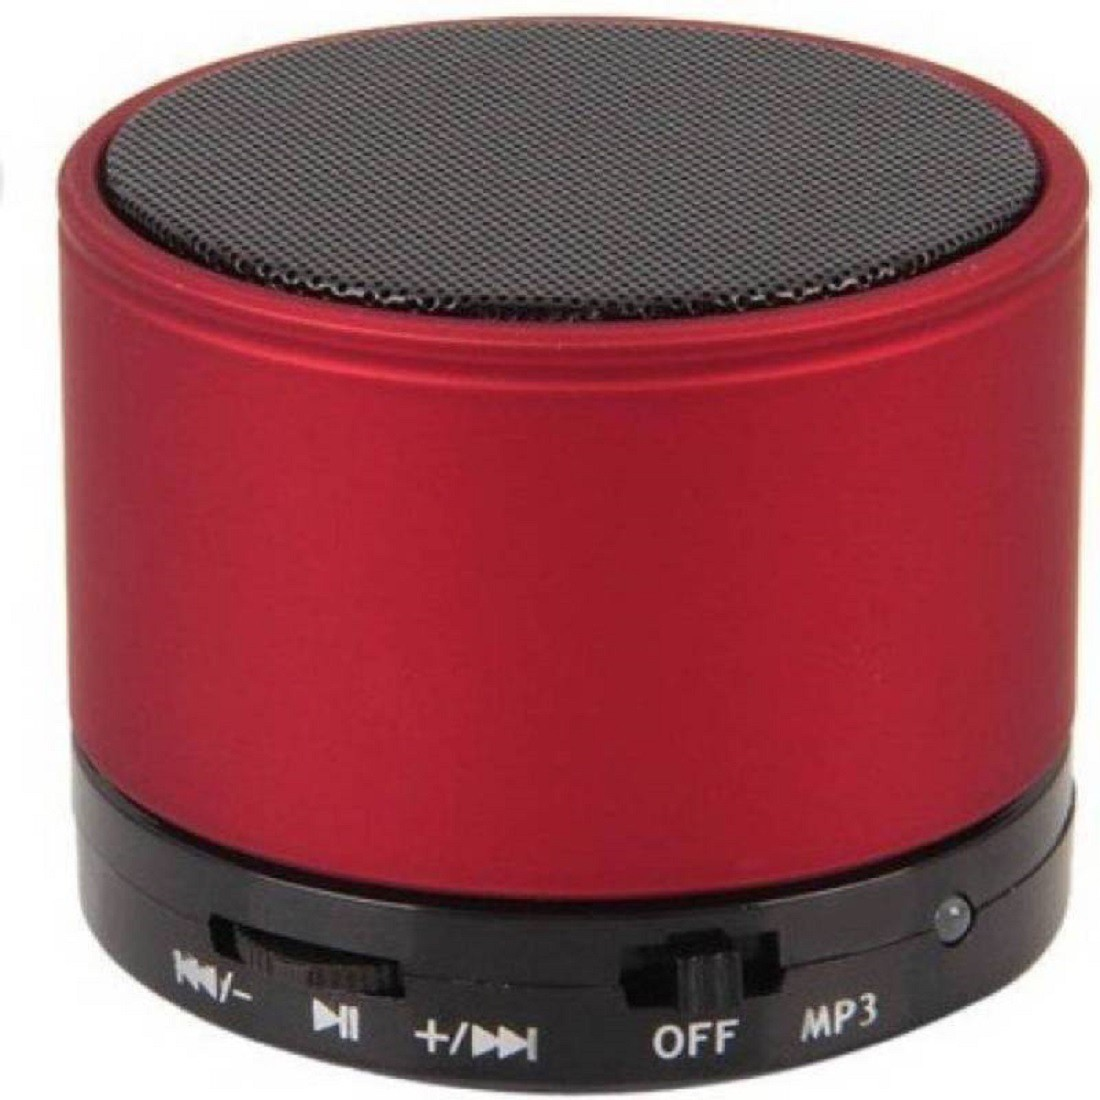 ROOQ S10RE-003 Portable Bluetooth Laptop/Desktop Speaker(Red, 2.1 Channel)